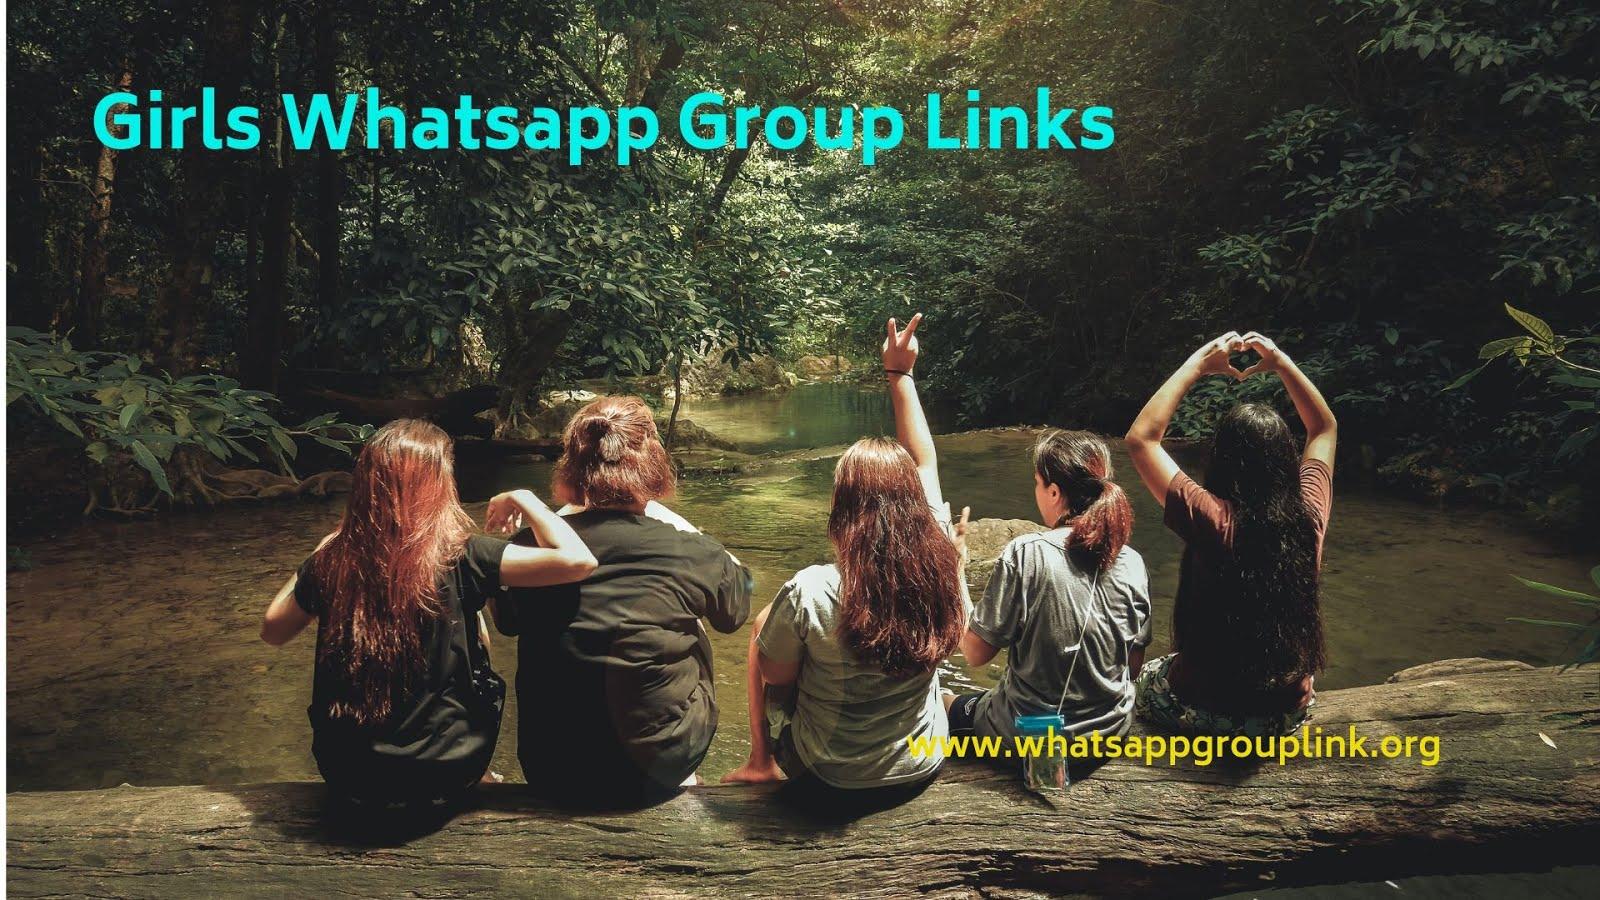 Whatsapp Group Link: Girls Whatsapp Group Links